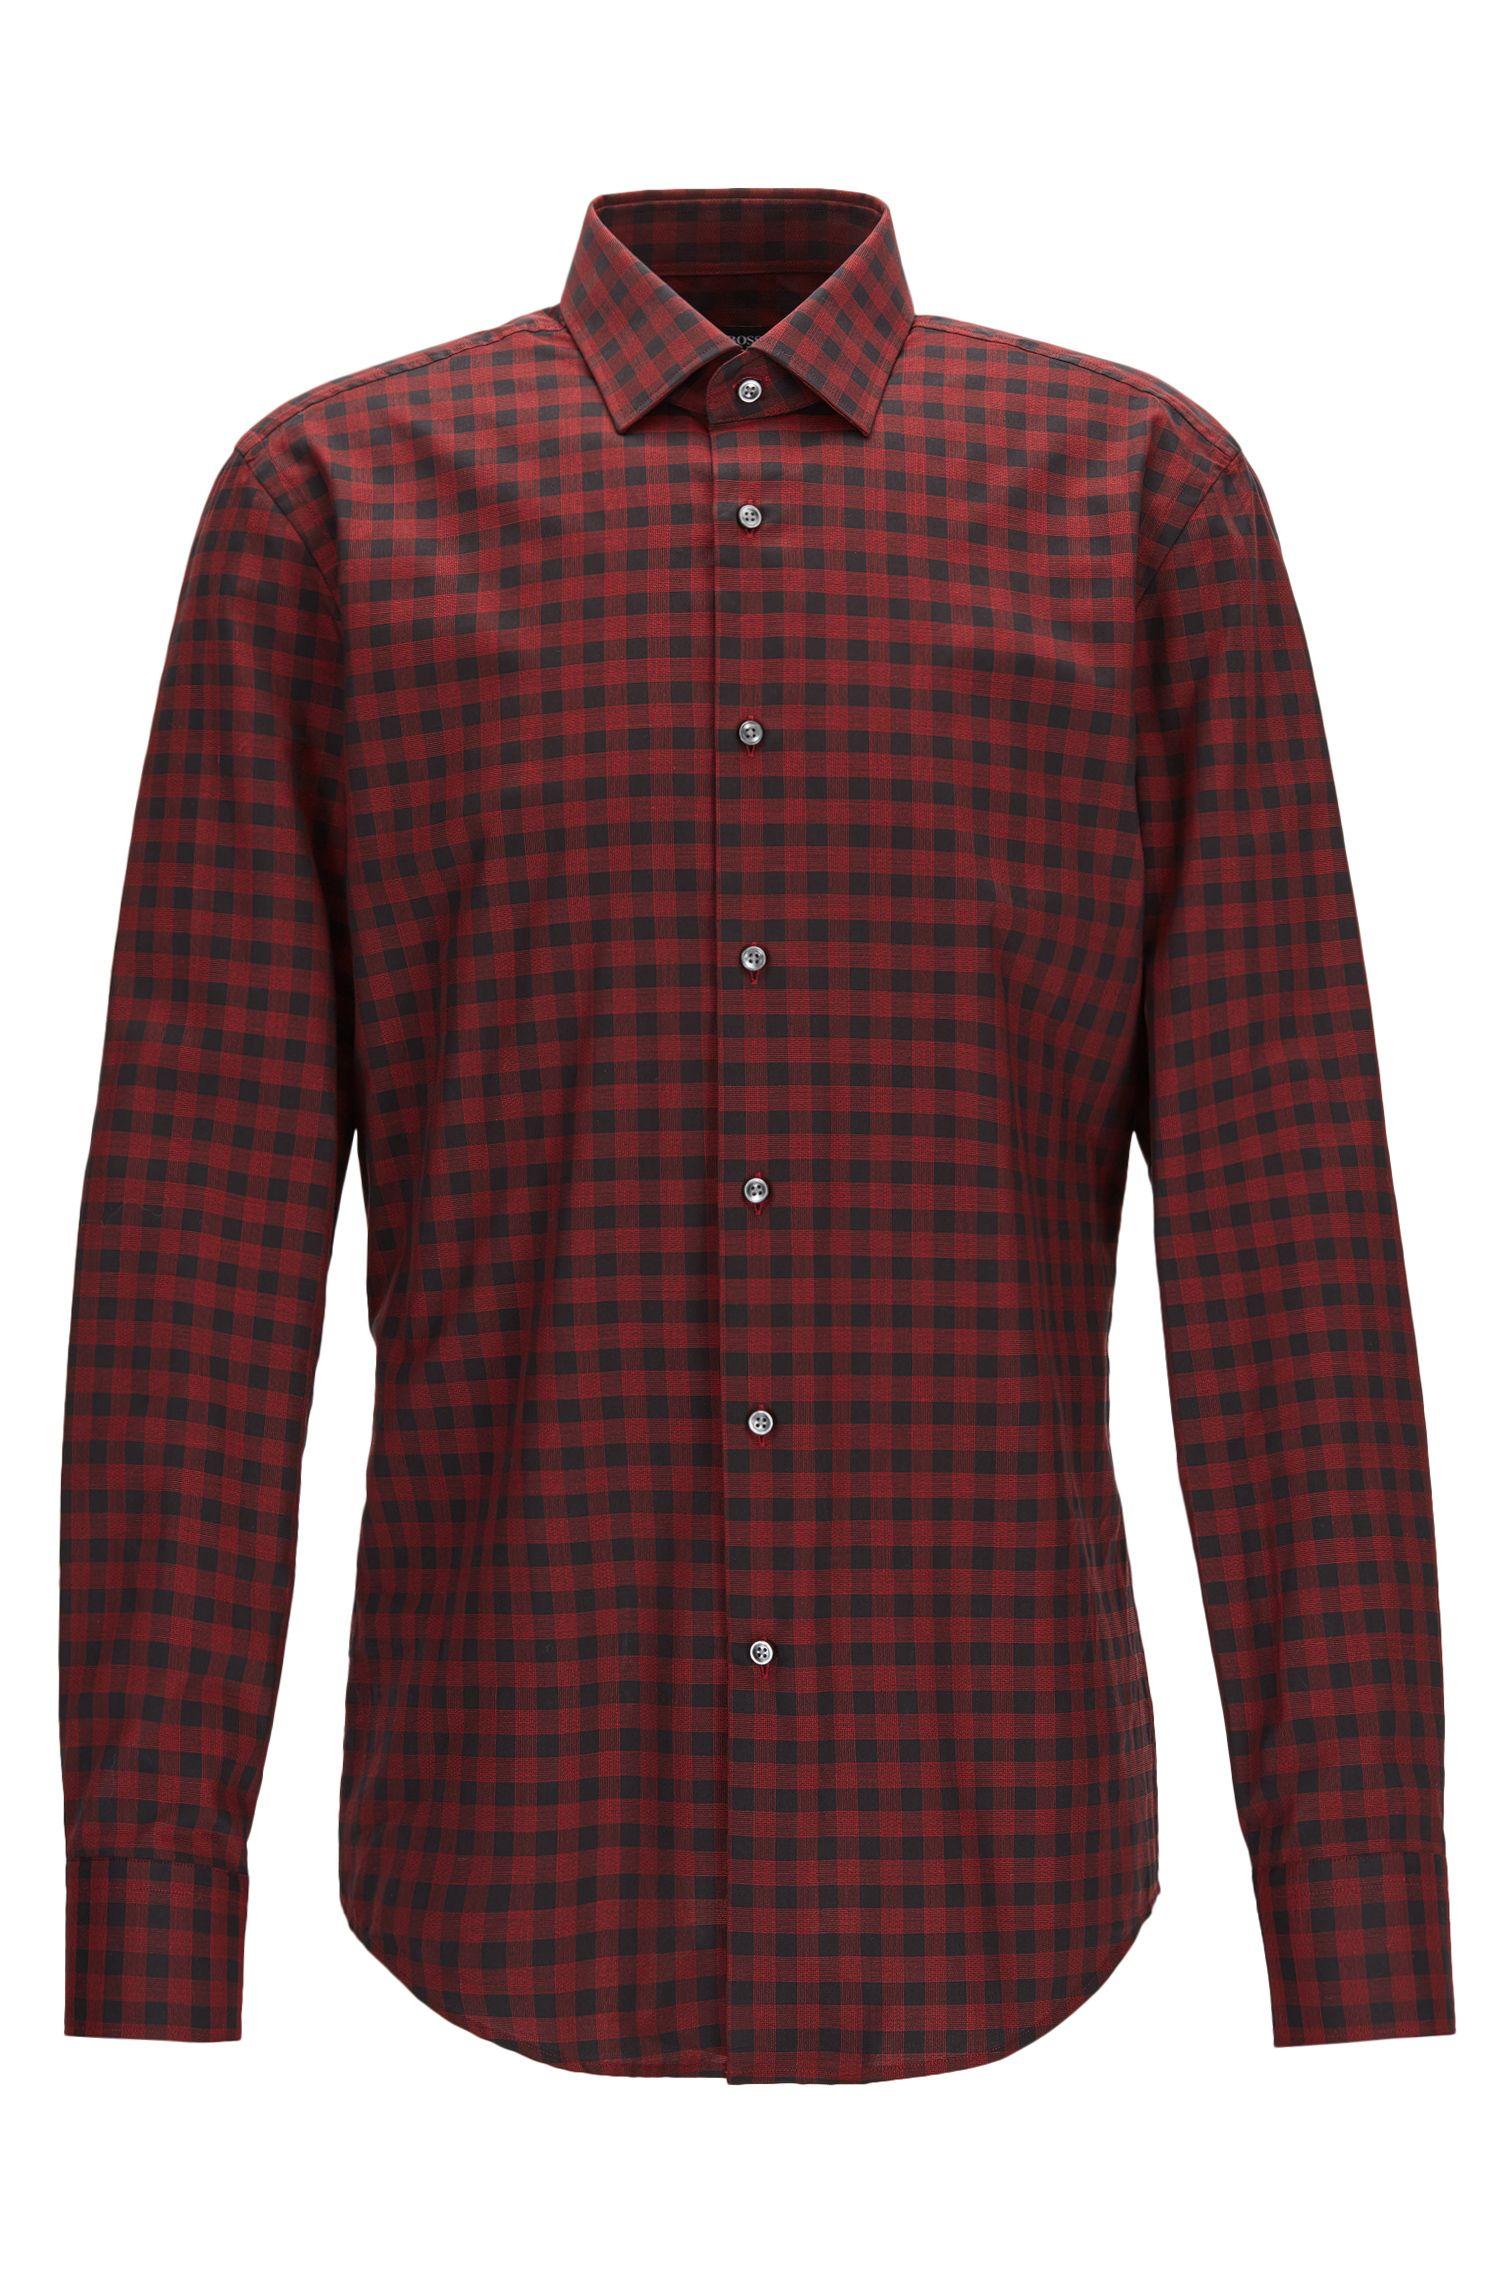 Gingham Cotton Dress Shirt, Slim Fit | Jenno